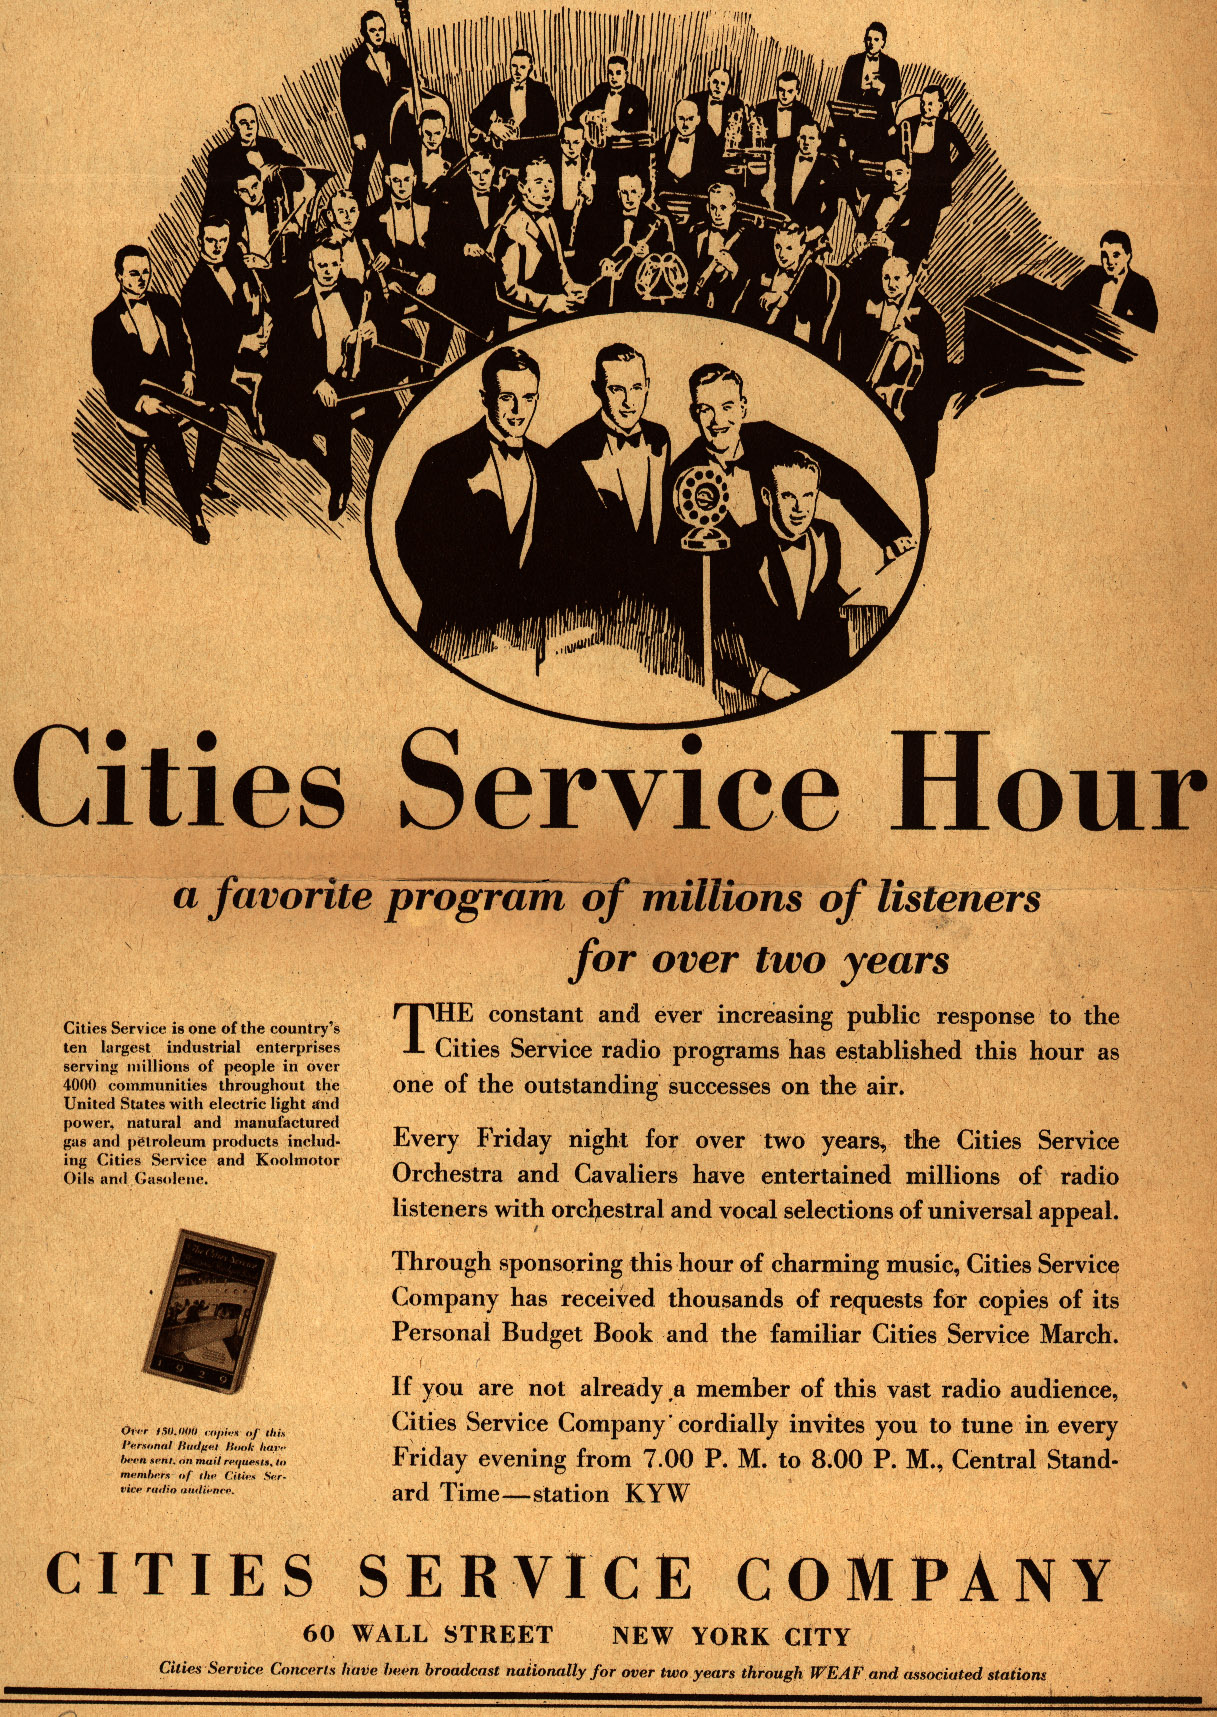 City Service Hour